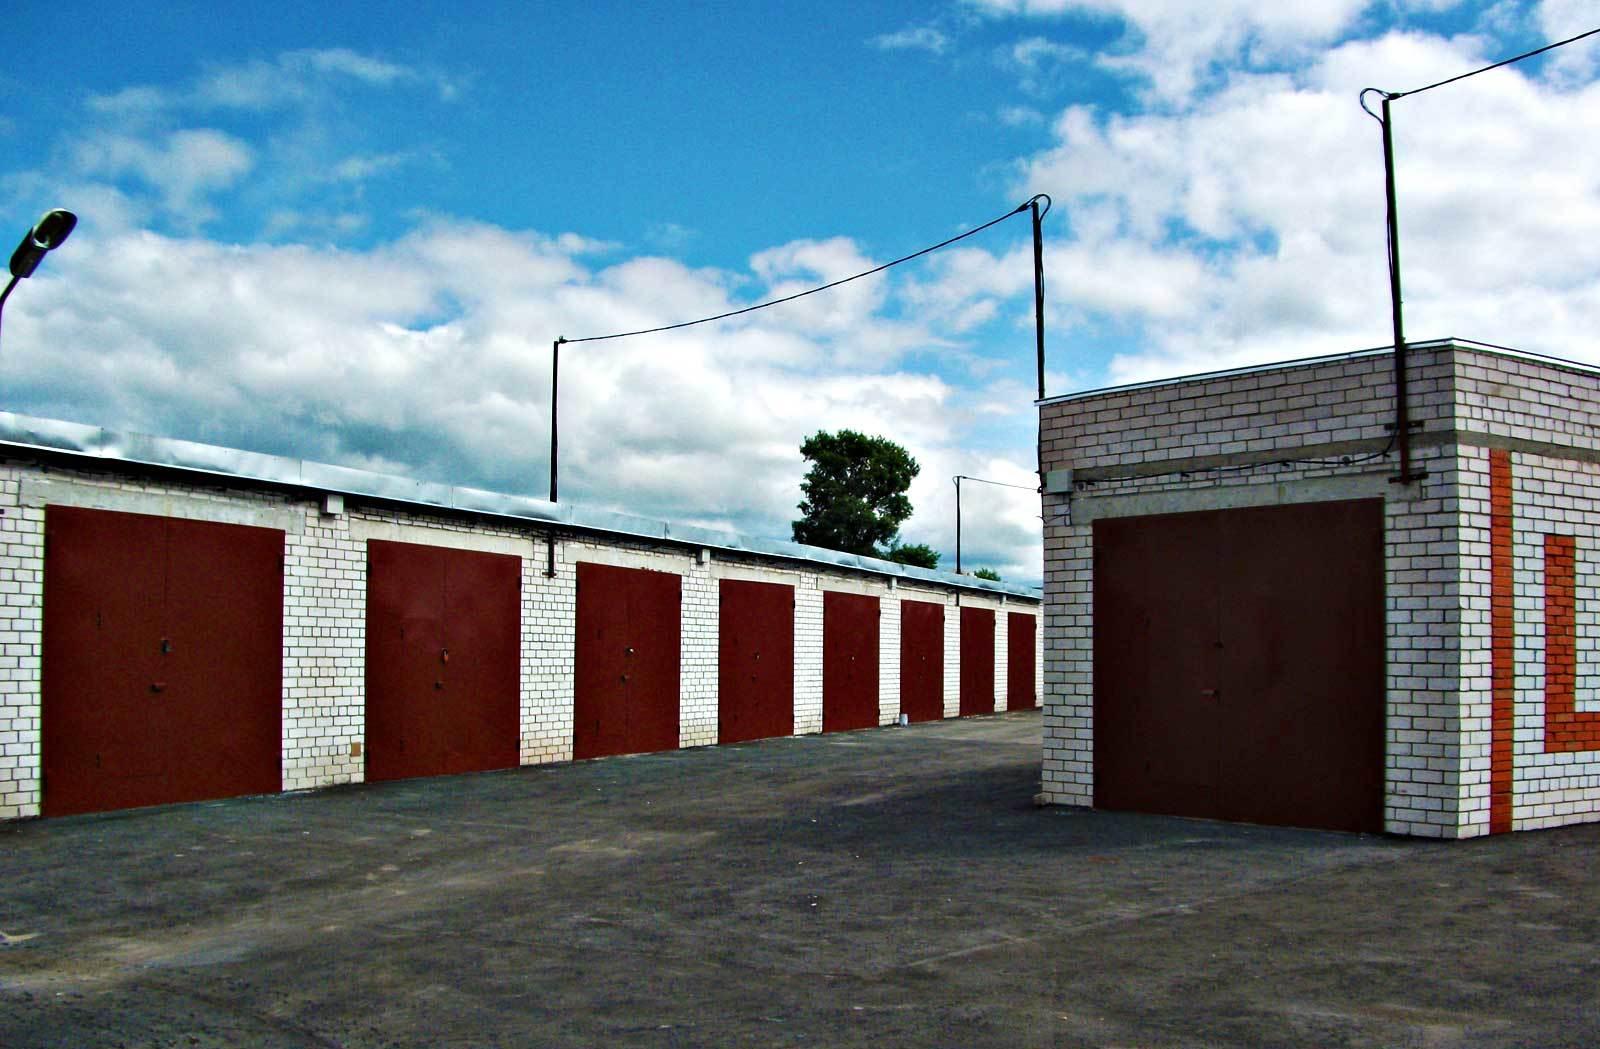 Охрана гаражного кооператива